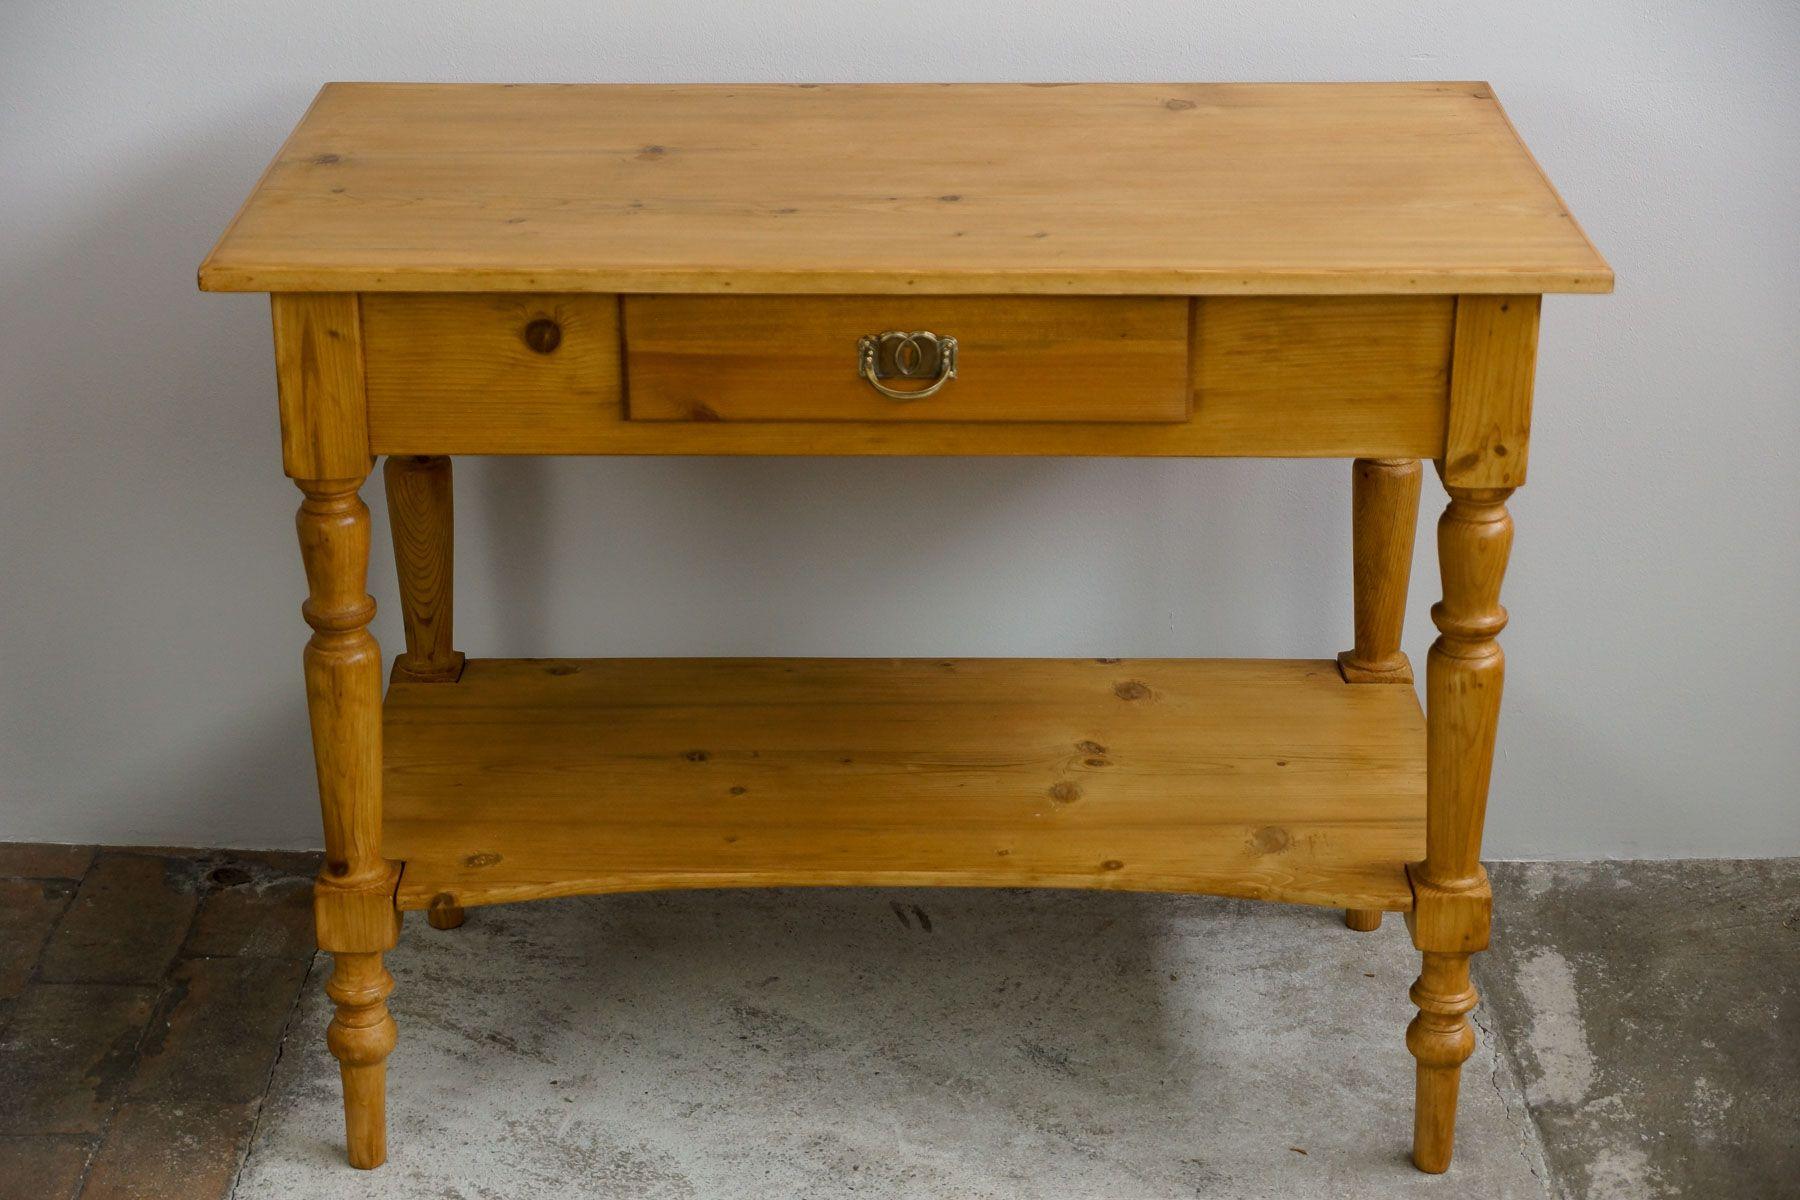 tavolo da cucina gründerzeit antico in legno dolce, inizio xx ... - Tavolo Da Cucina In Legno Antico